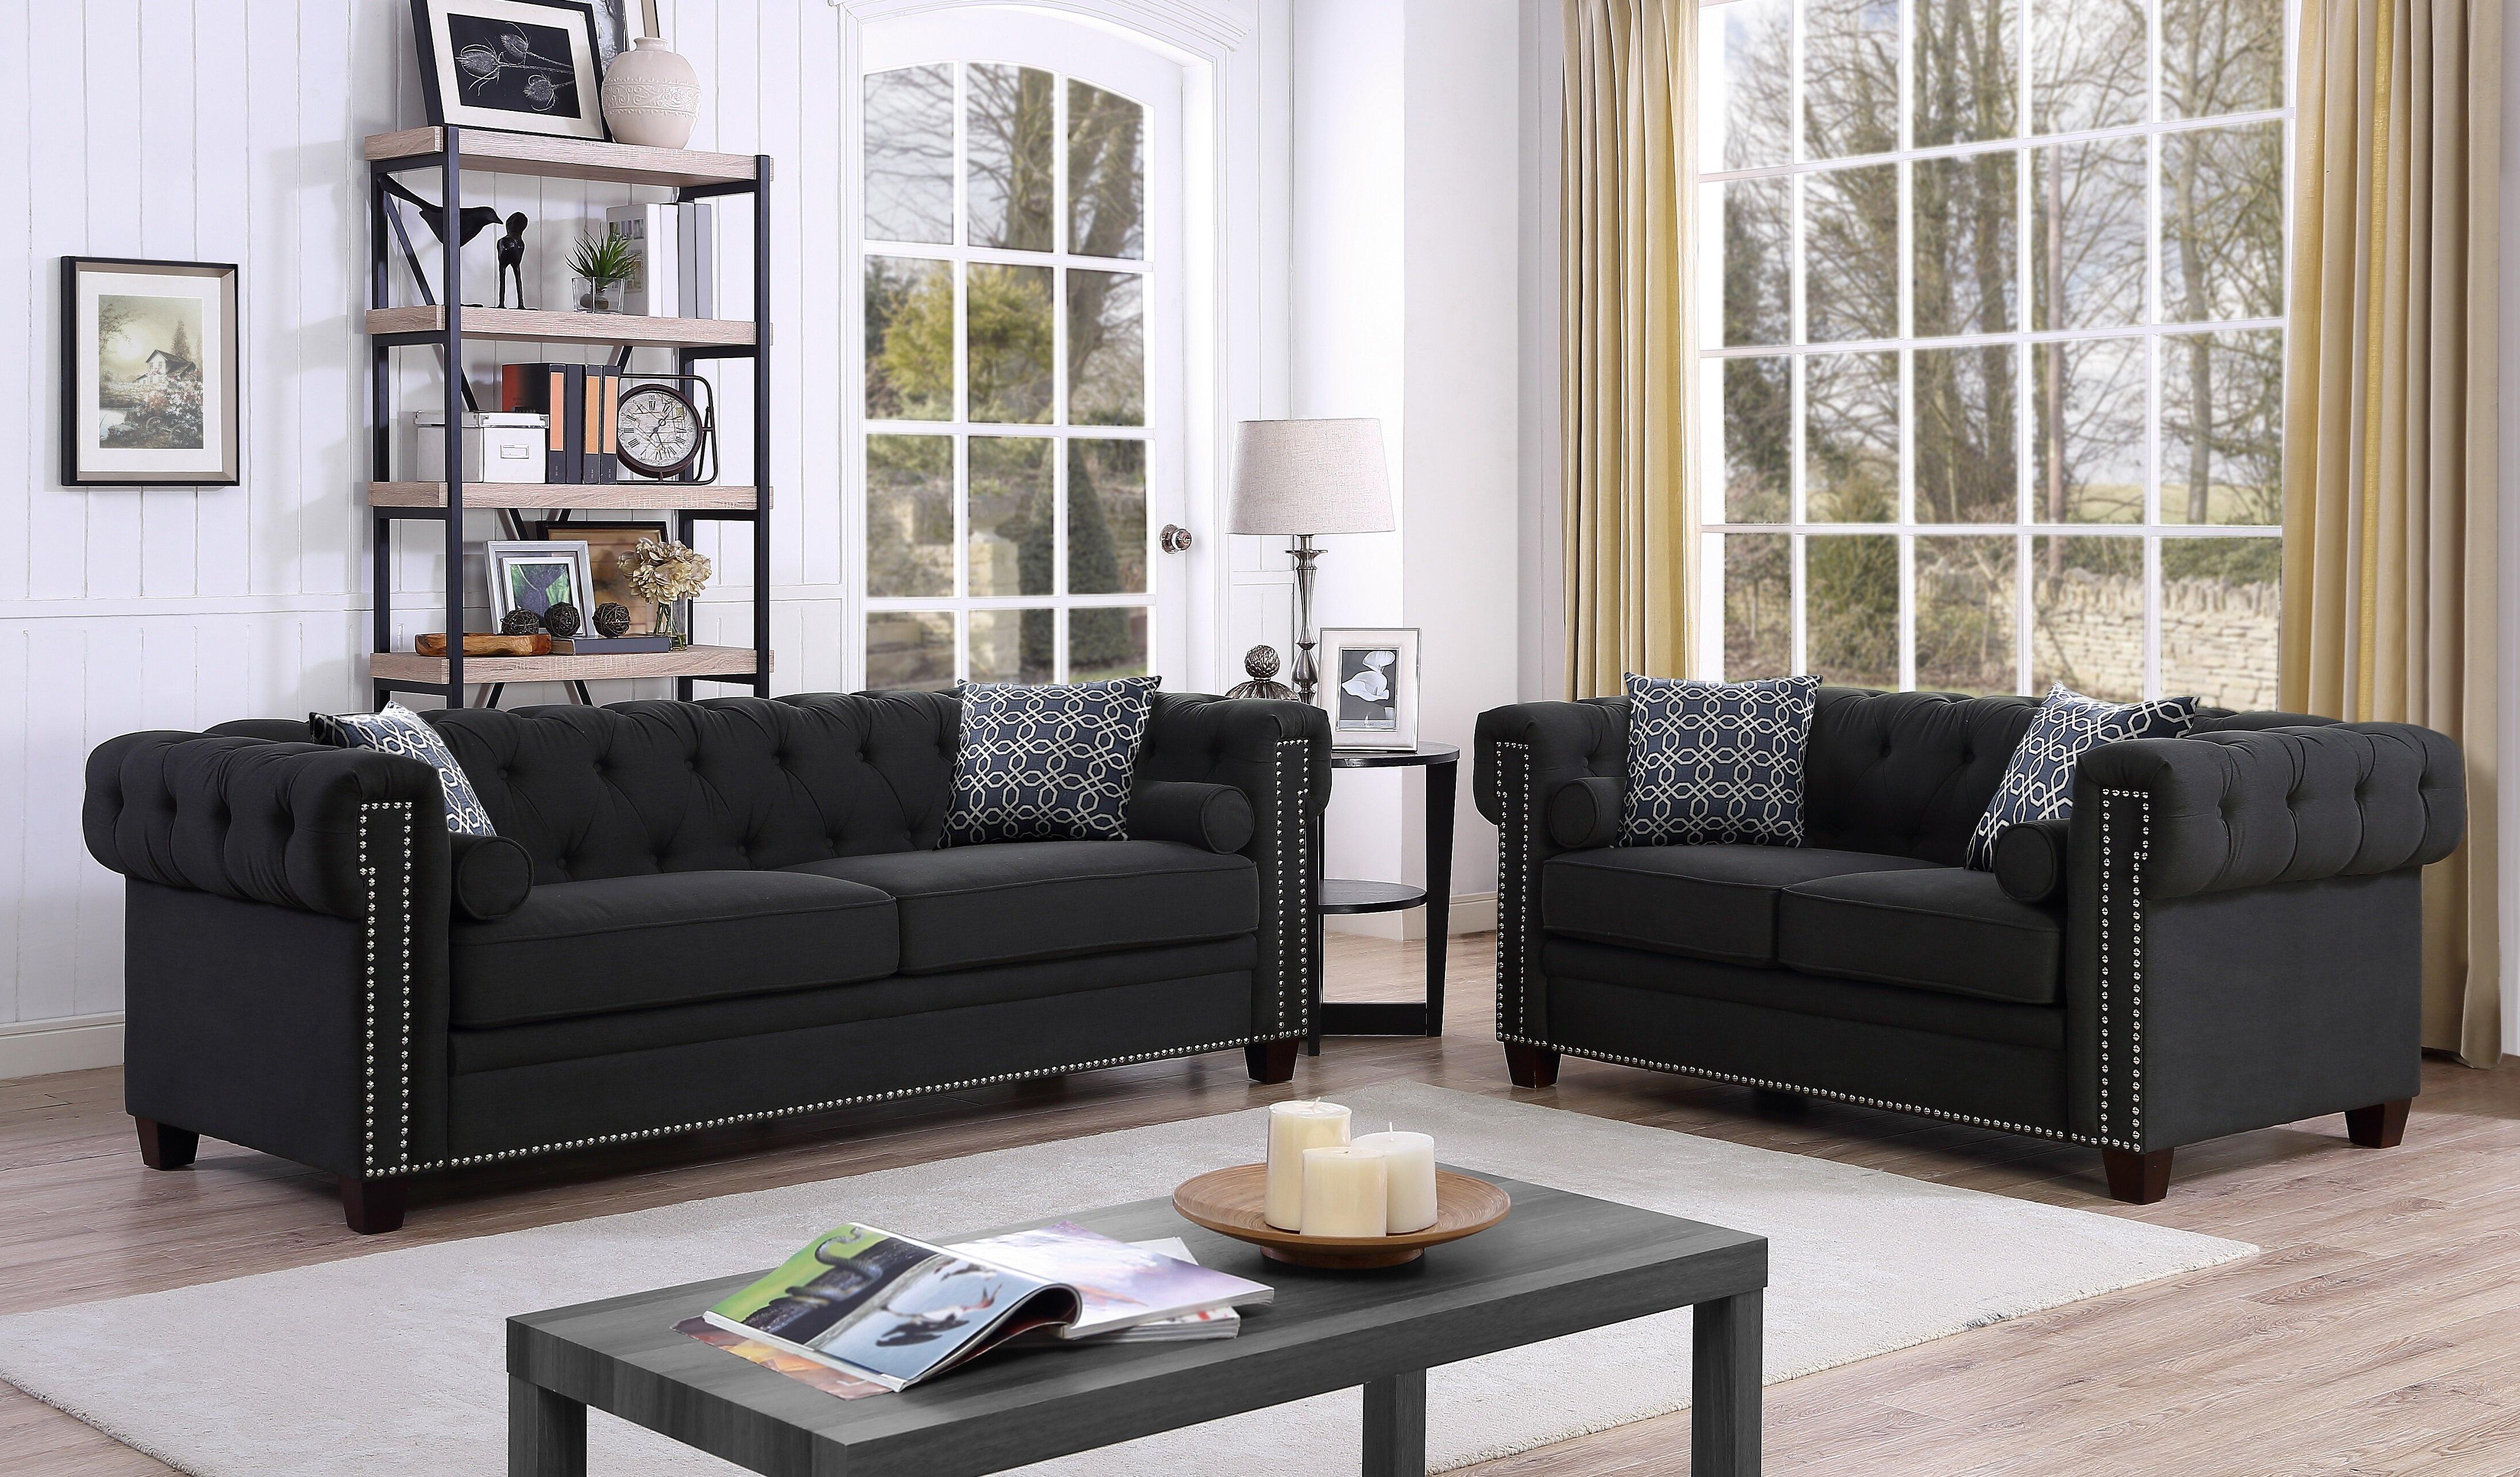 Canora grey quan chesterfield nailhead 2 piece living room set wayfair